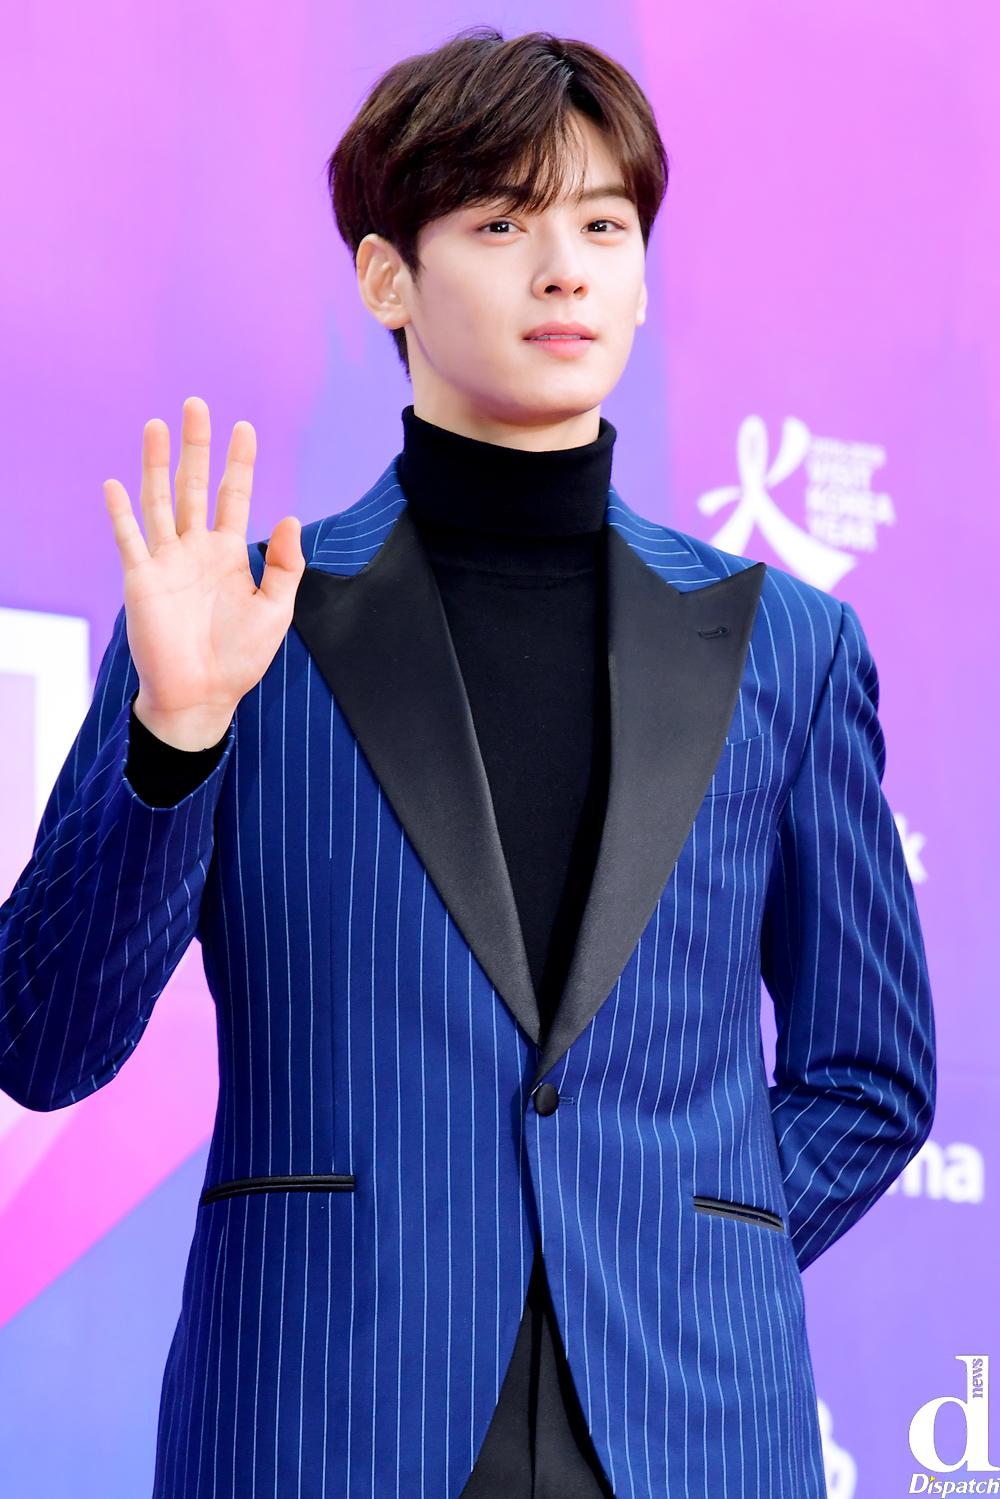 Cha Eunwoo Astro Asiachan Kpop Image Board